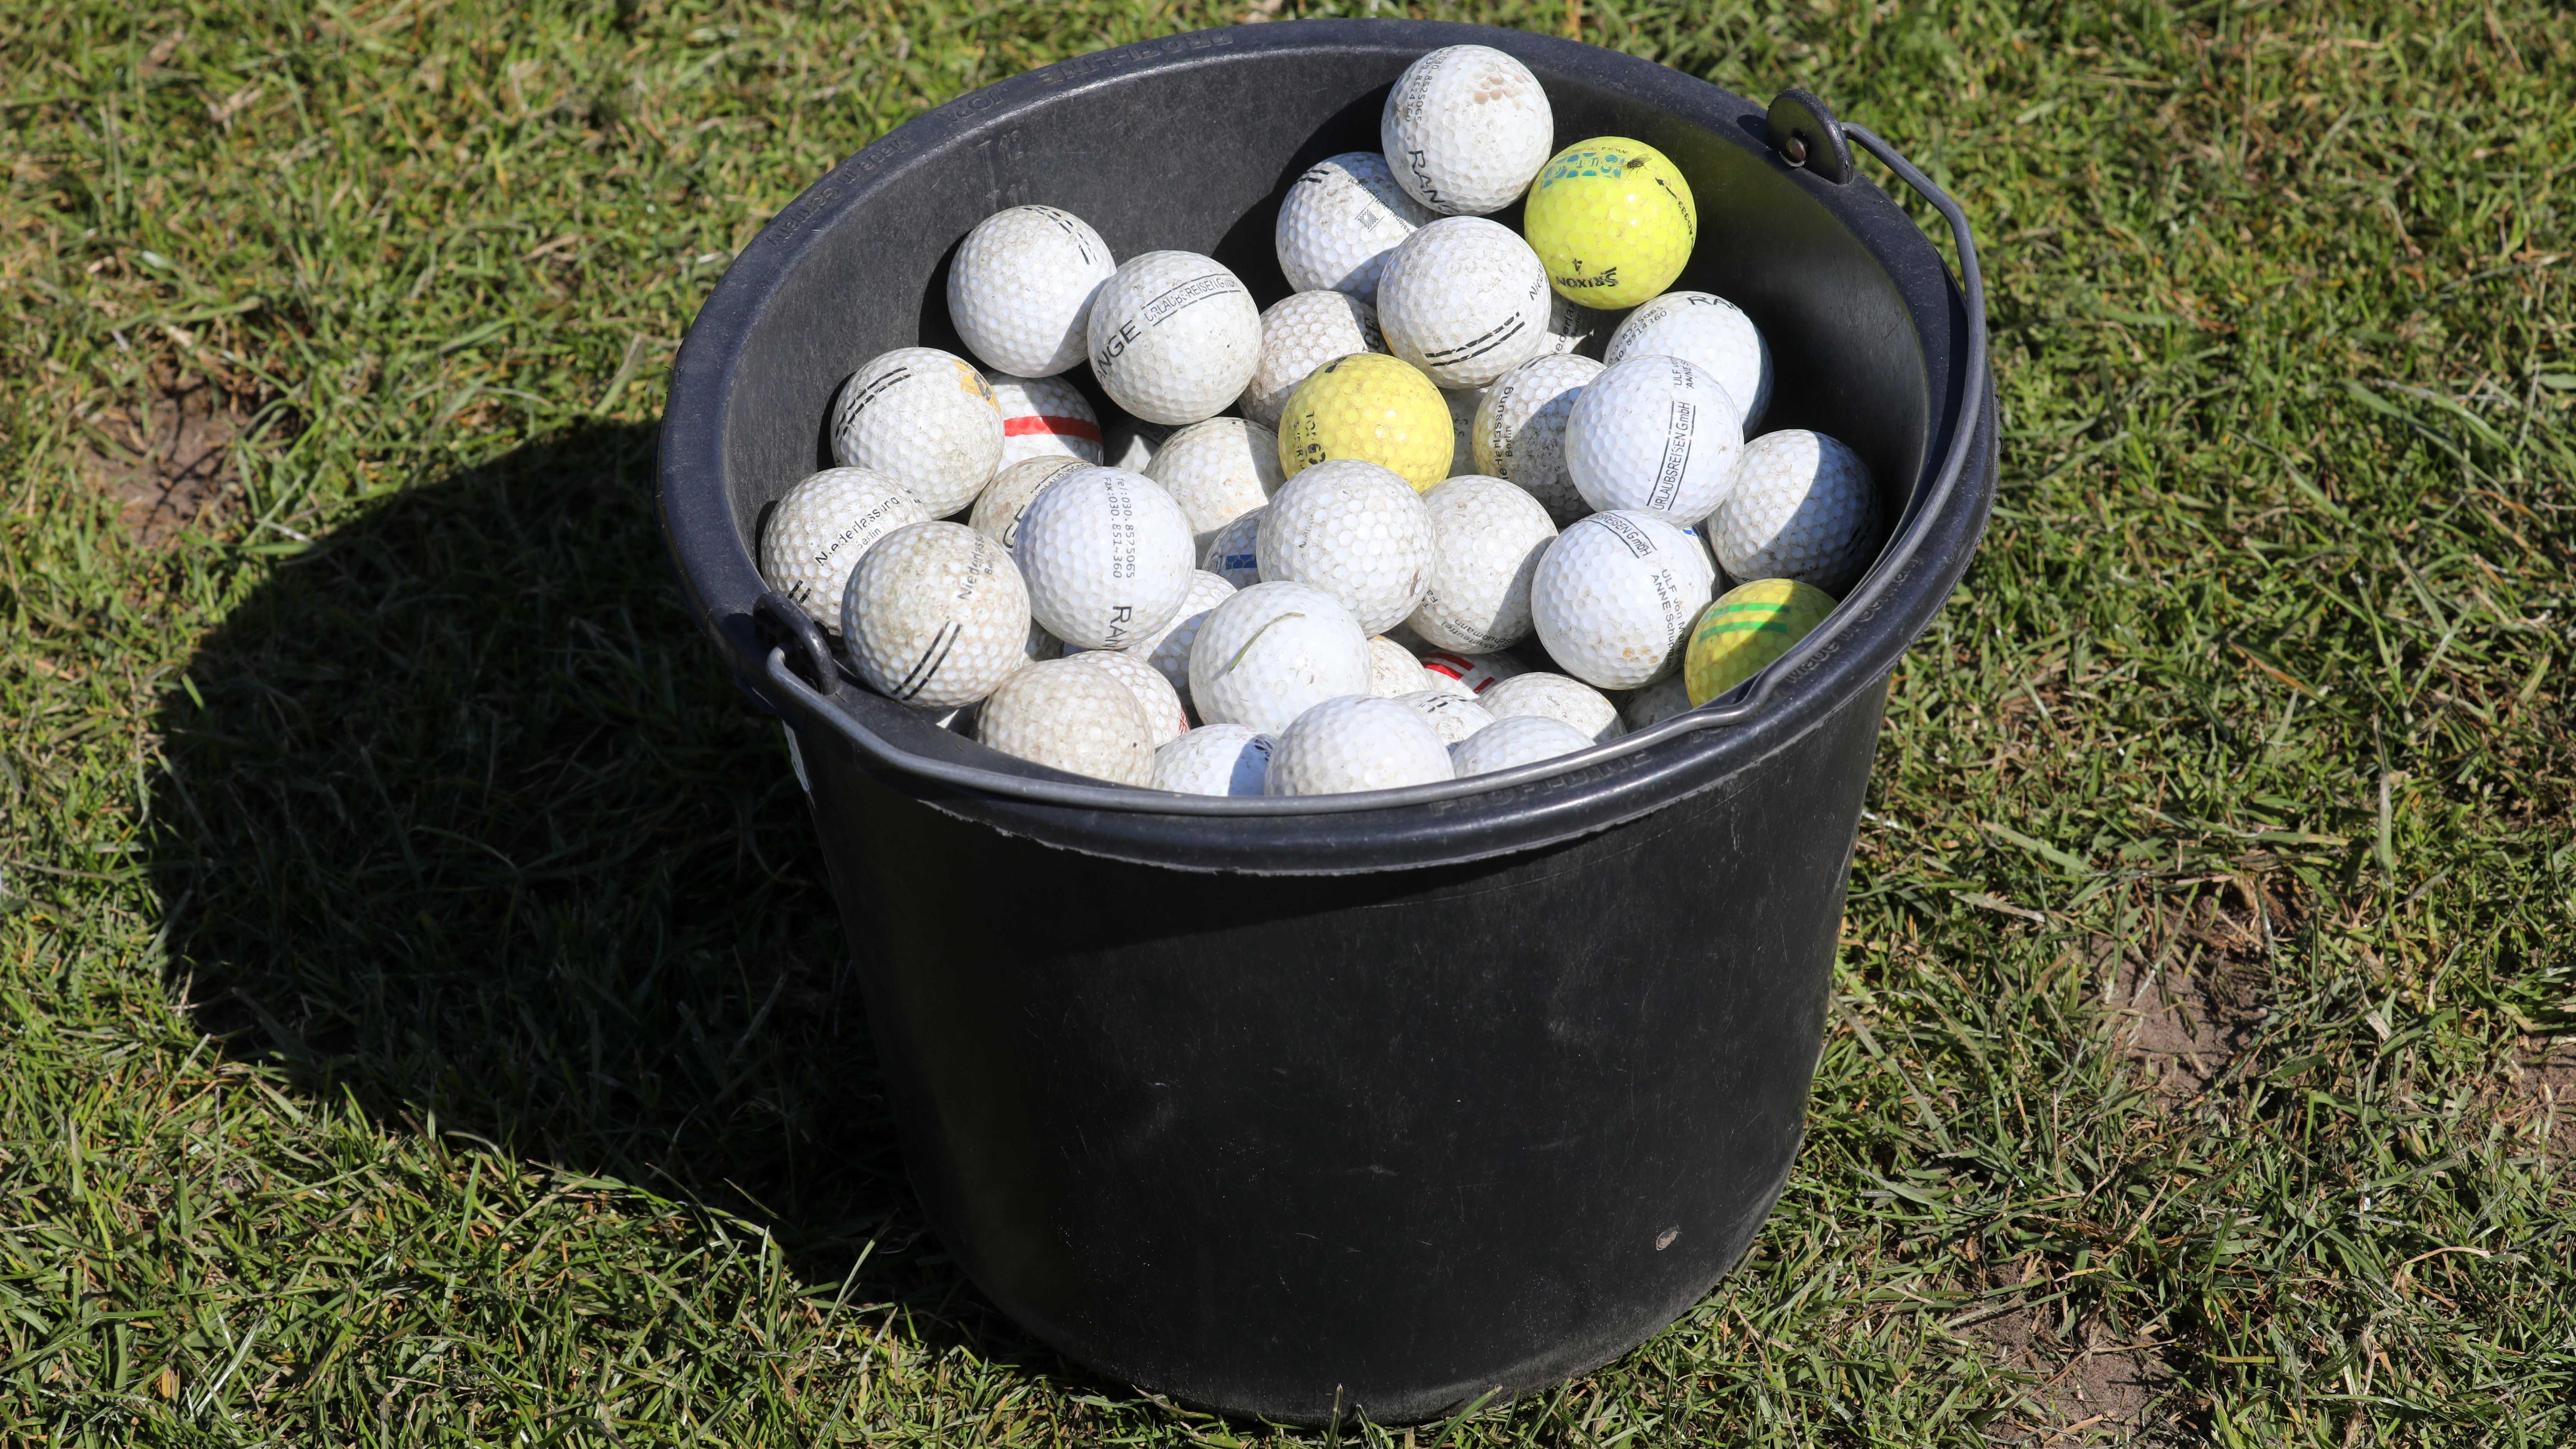 AGIC backs golf ball recycling program